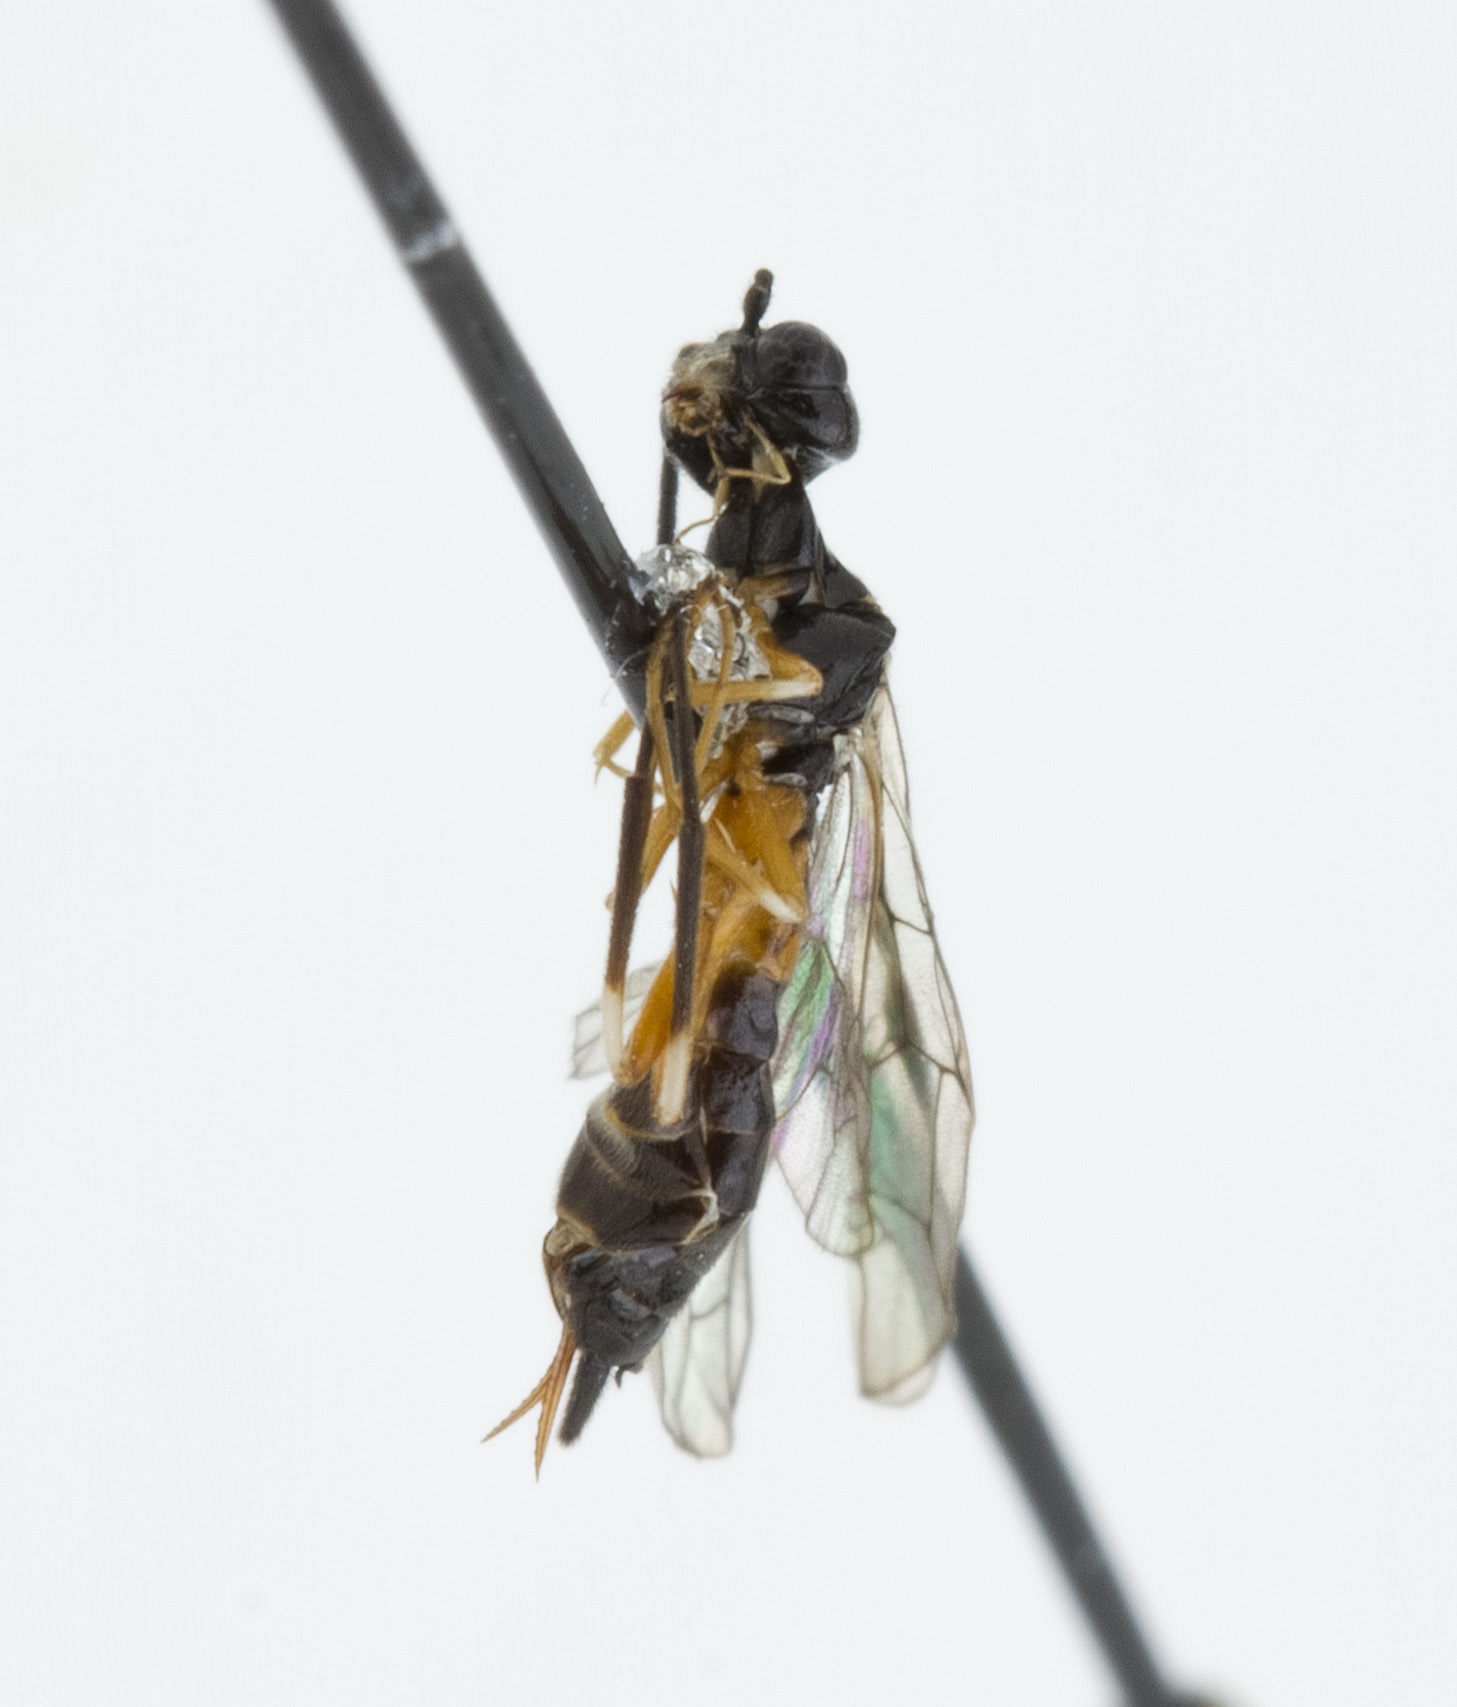 Image of stem sawflies